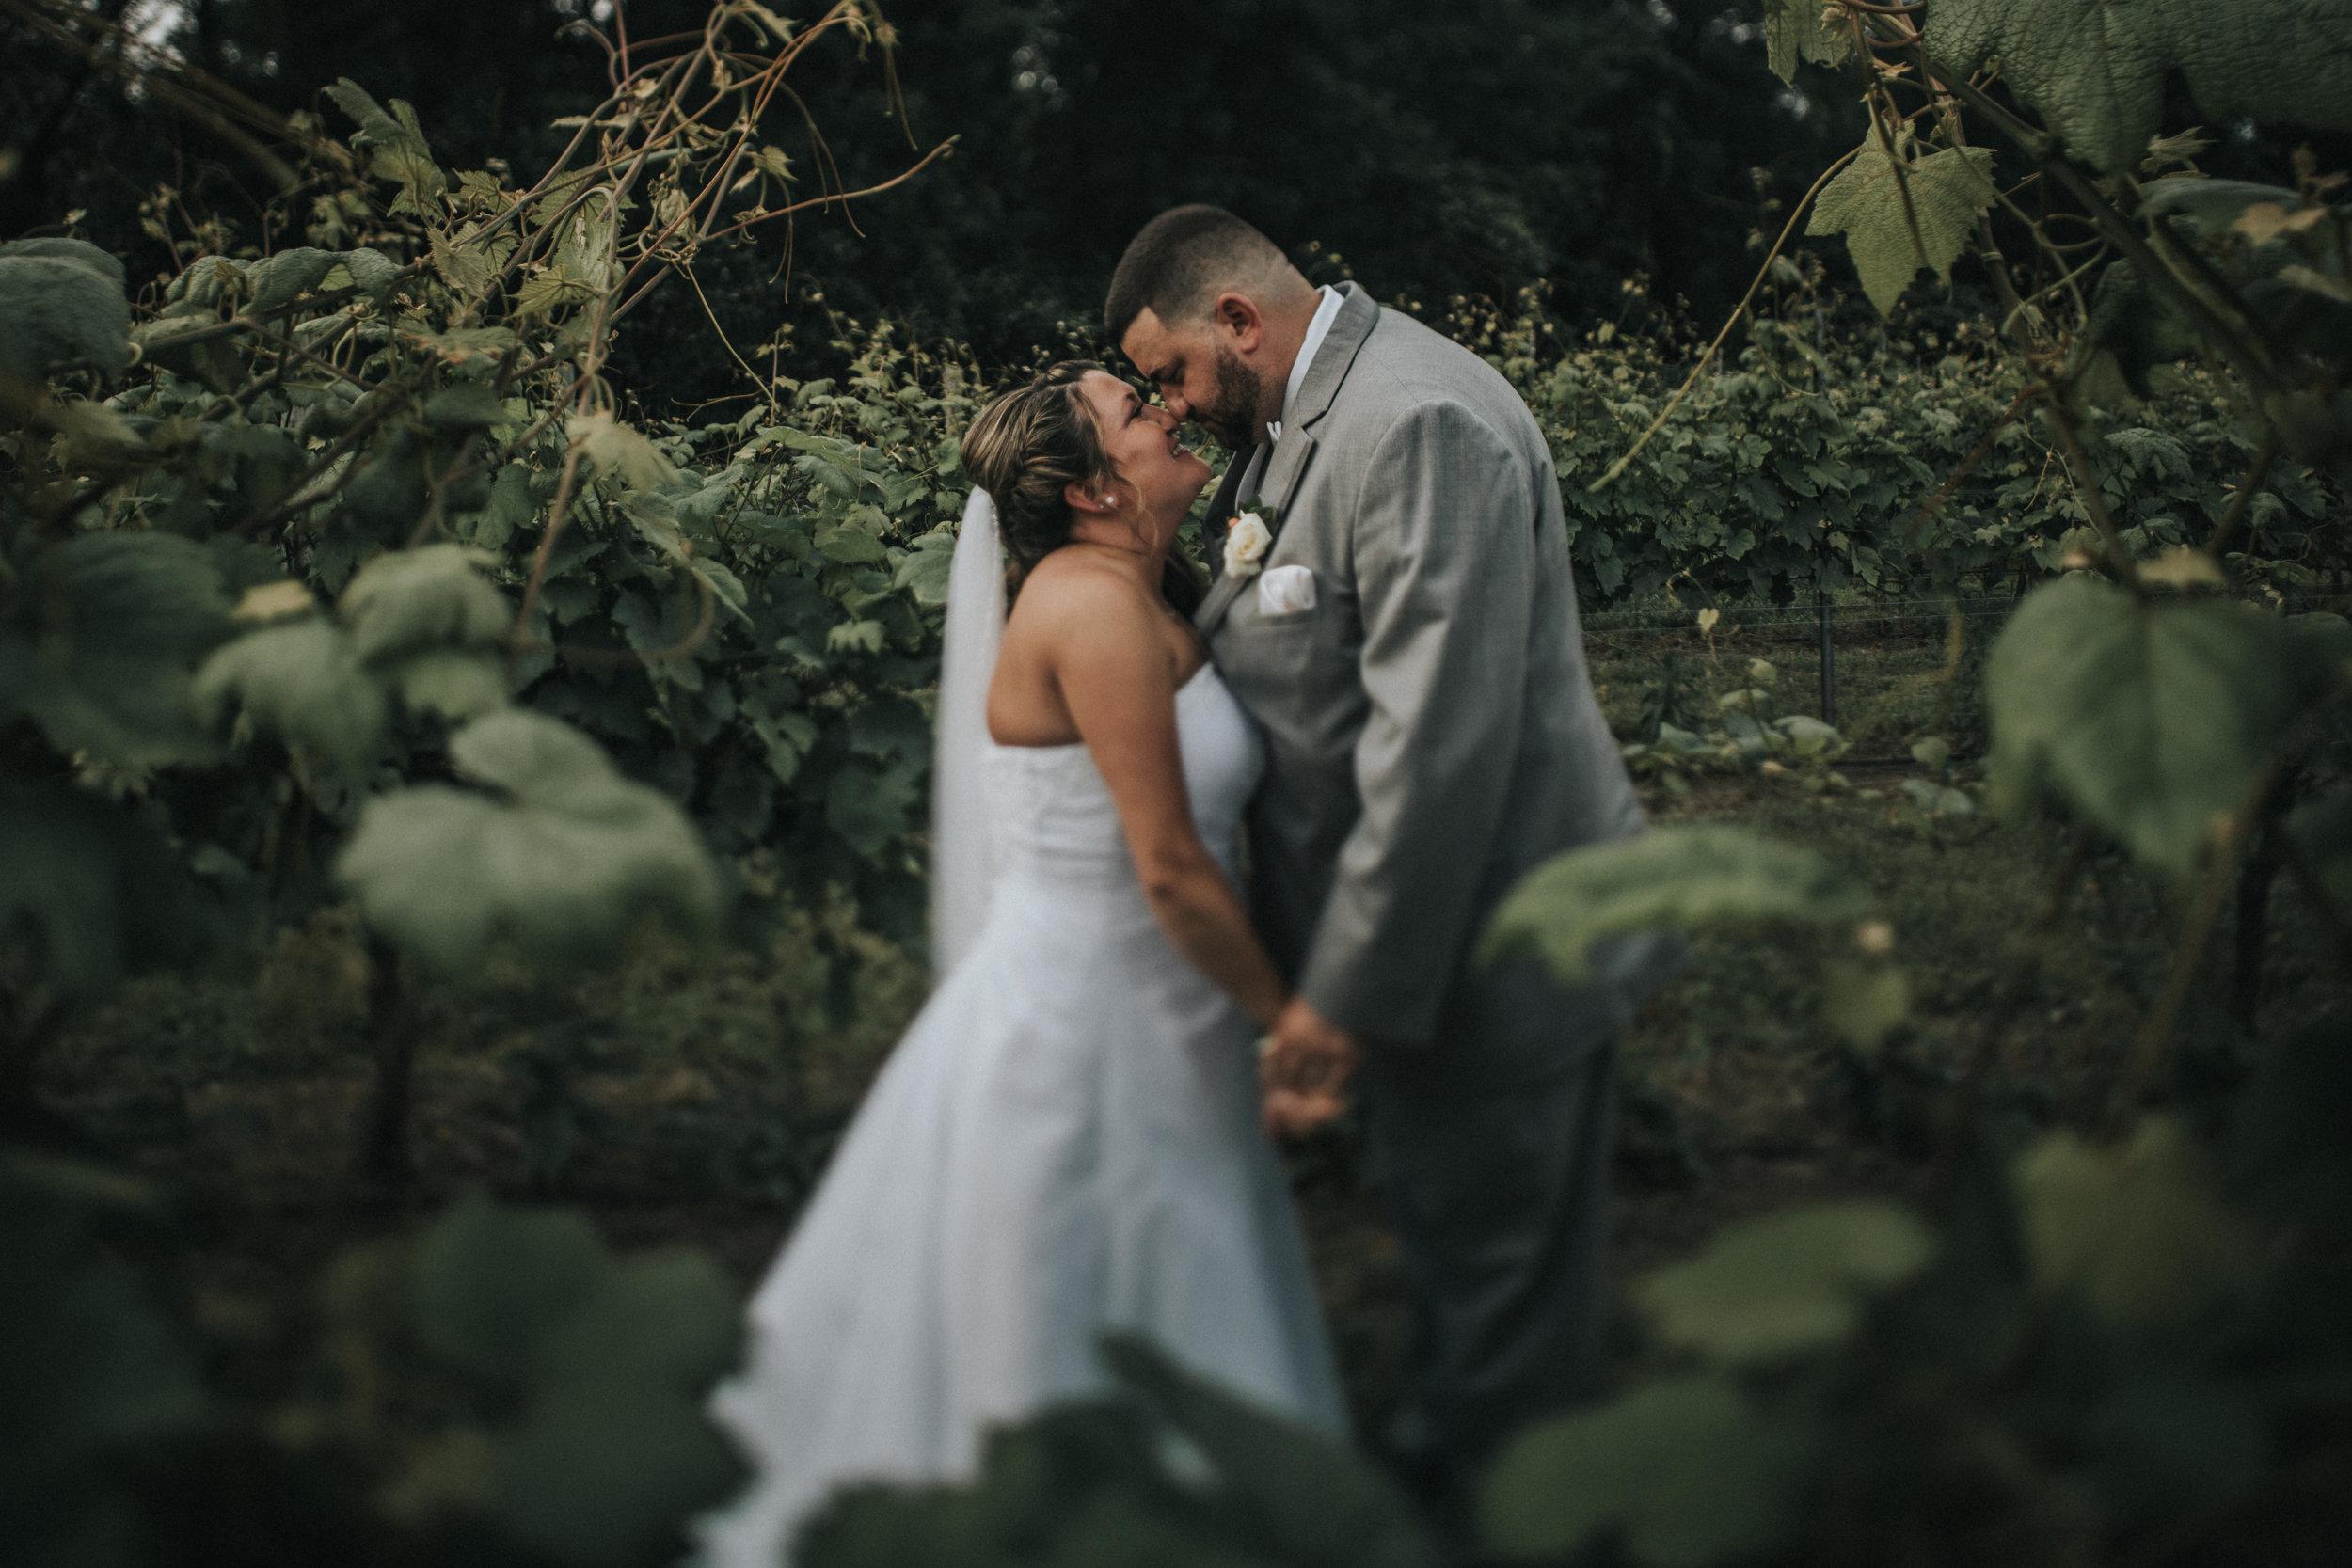 New-Jersey-Wedding-Photographer-JennaLynnPhotography-ValenzanoWinery-Bride&Groom-26.jpg